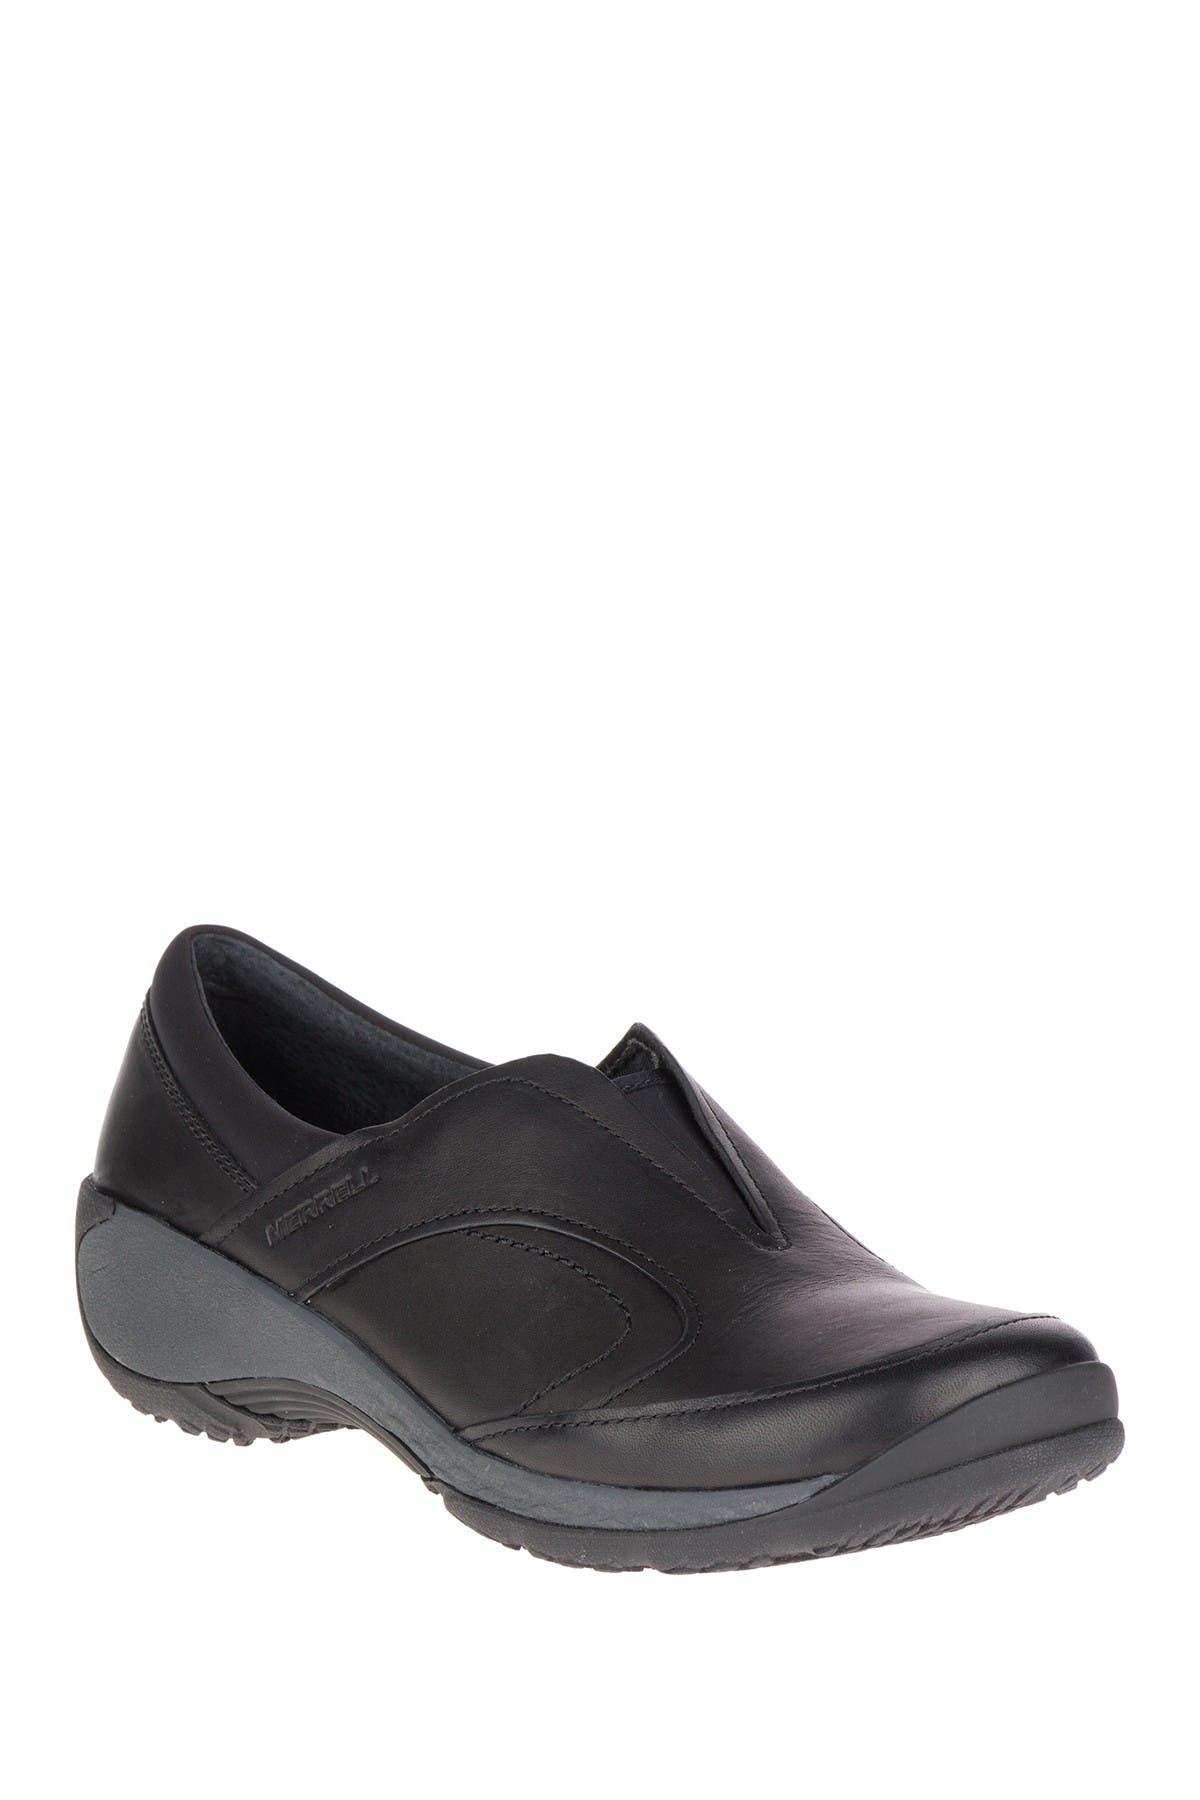 Image of Merrell Encore Q2 Moc Leather Flat